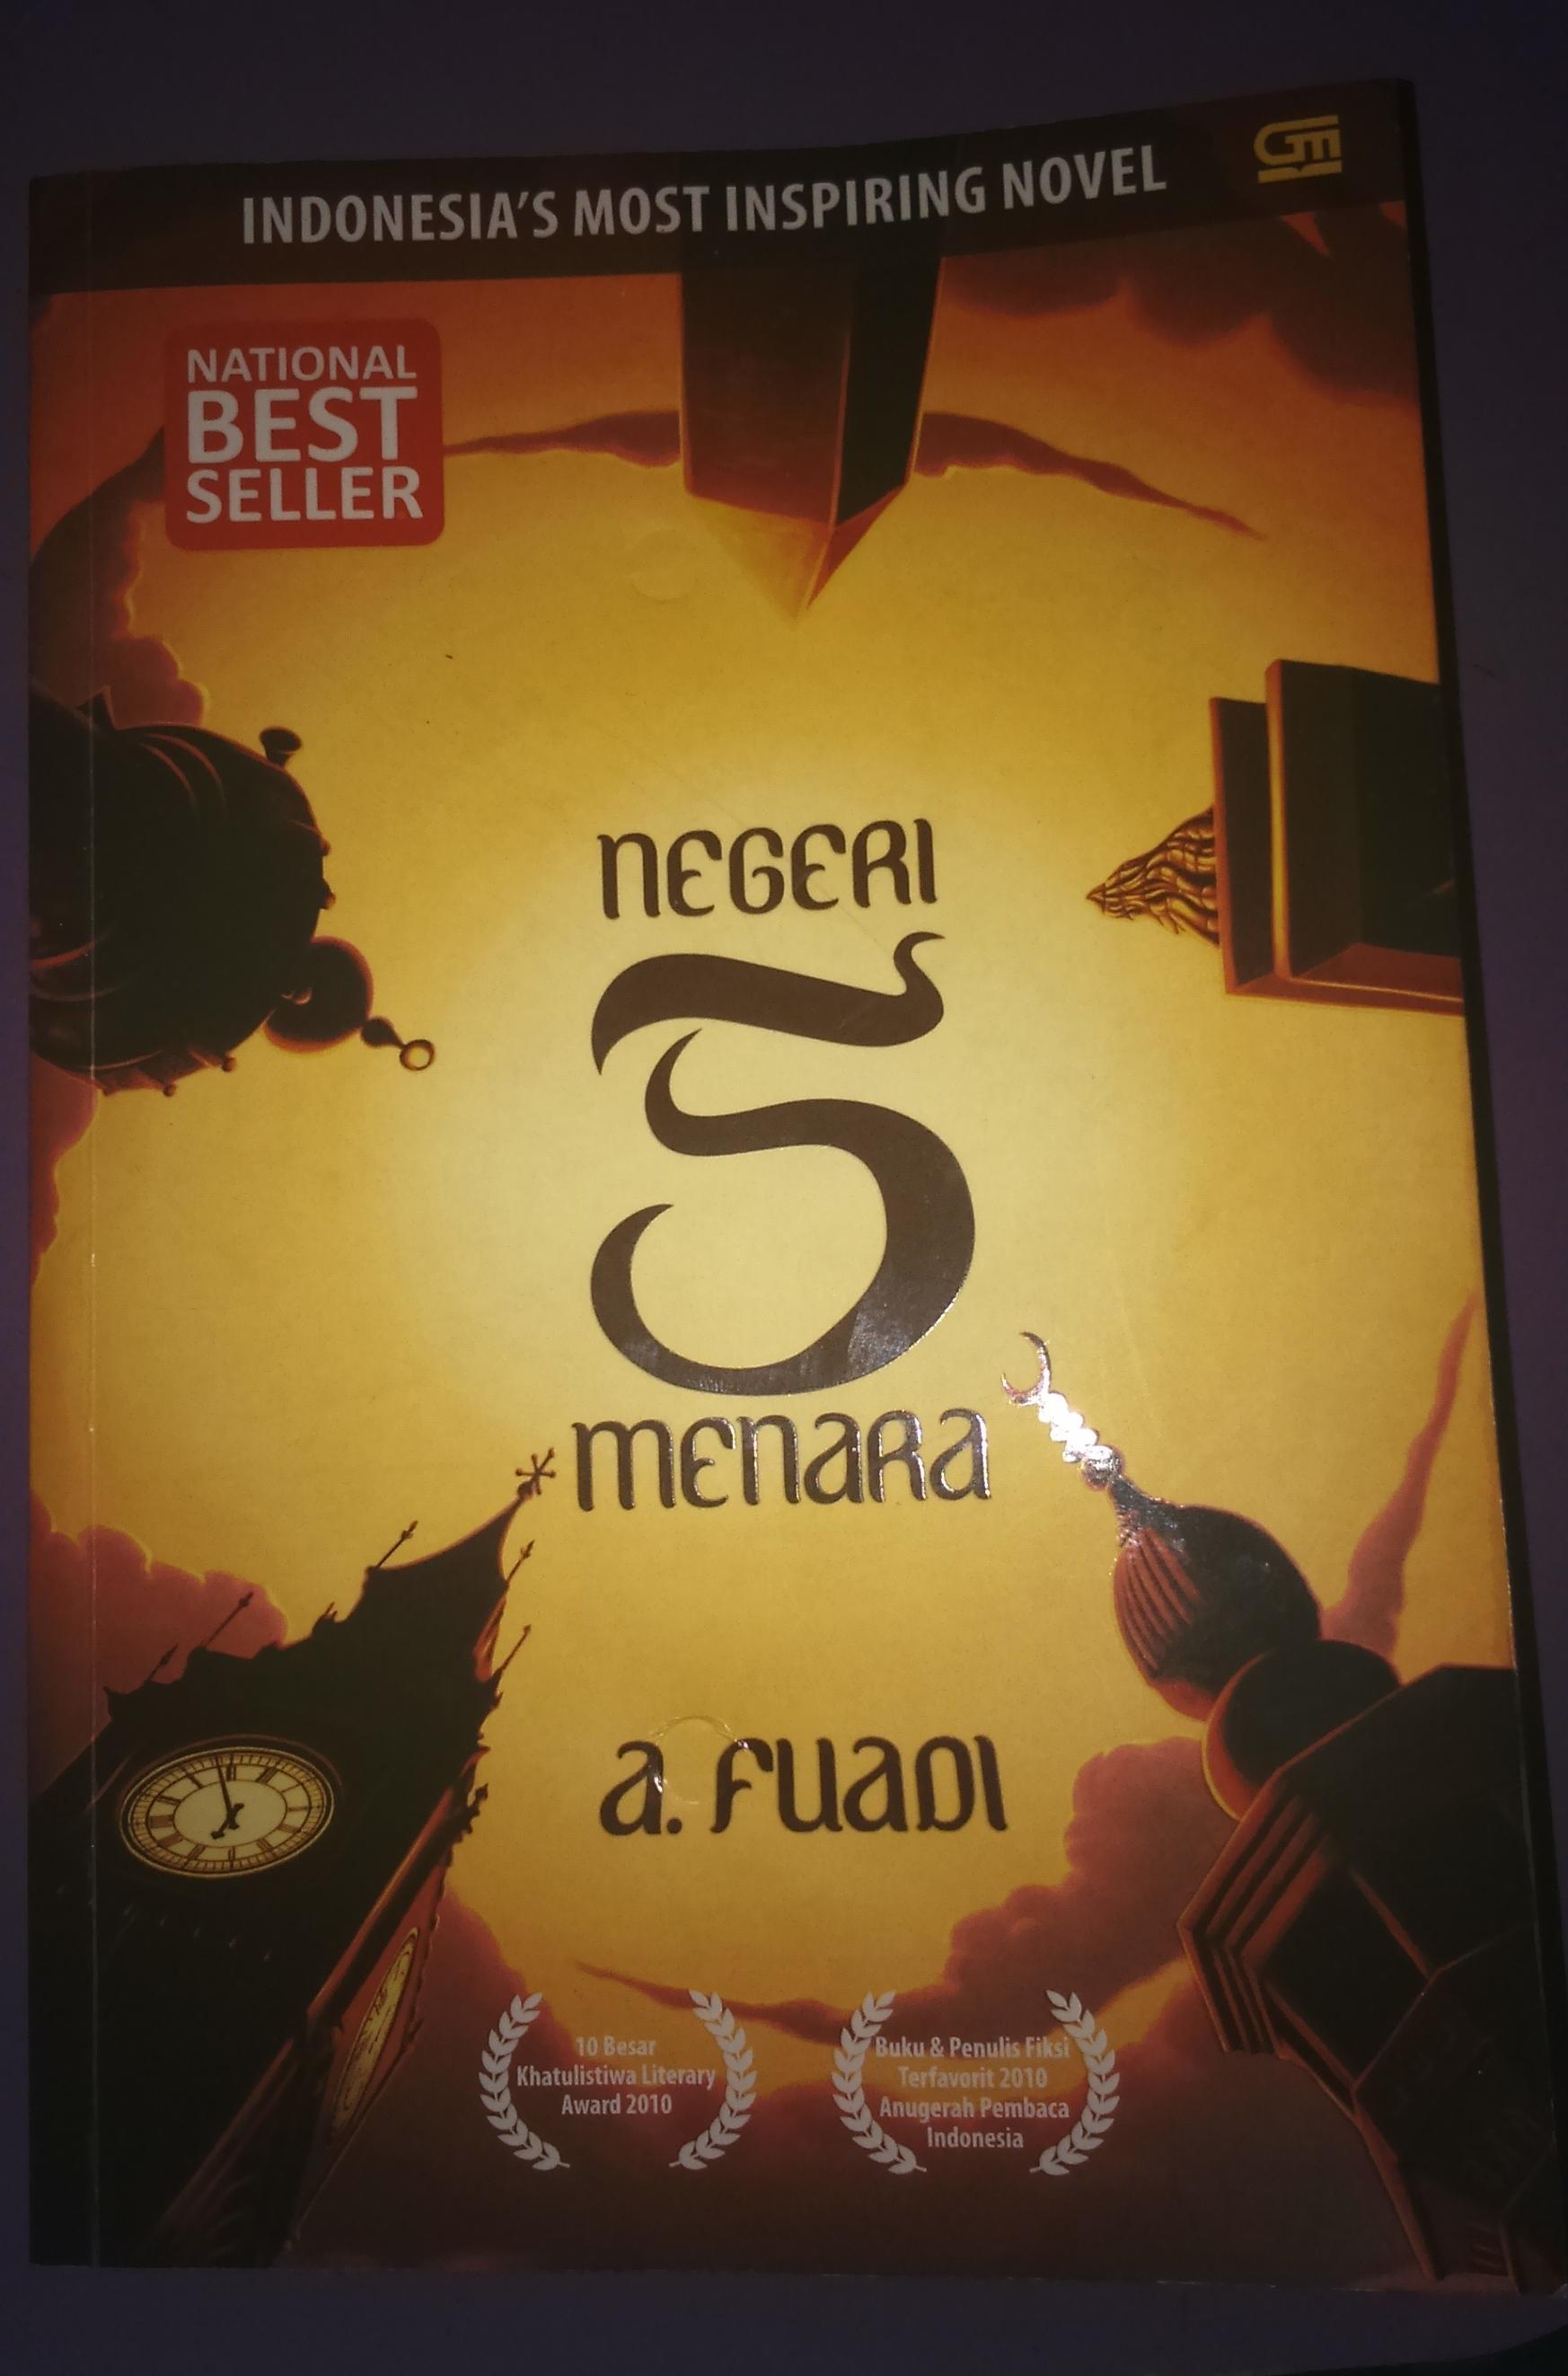 Resume Novel Negeri 5 Menara